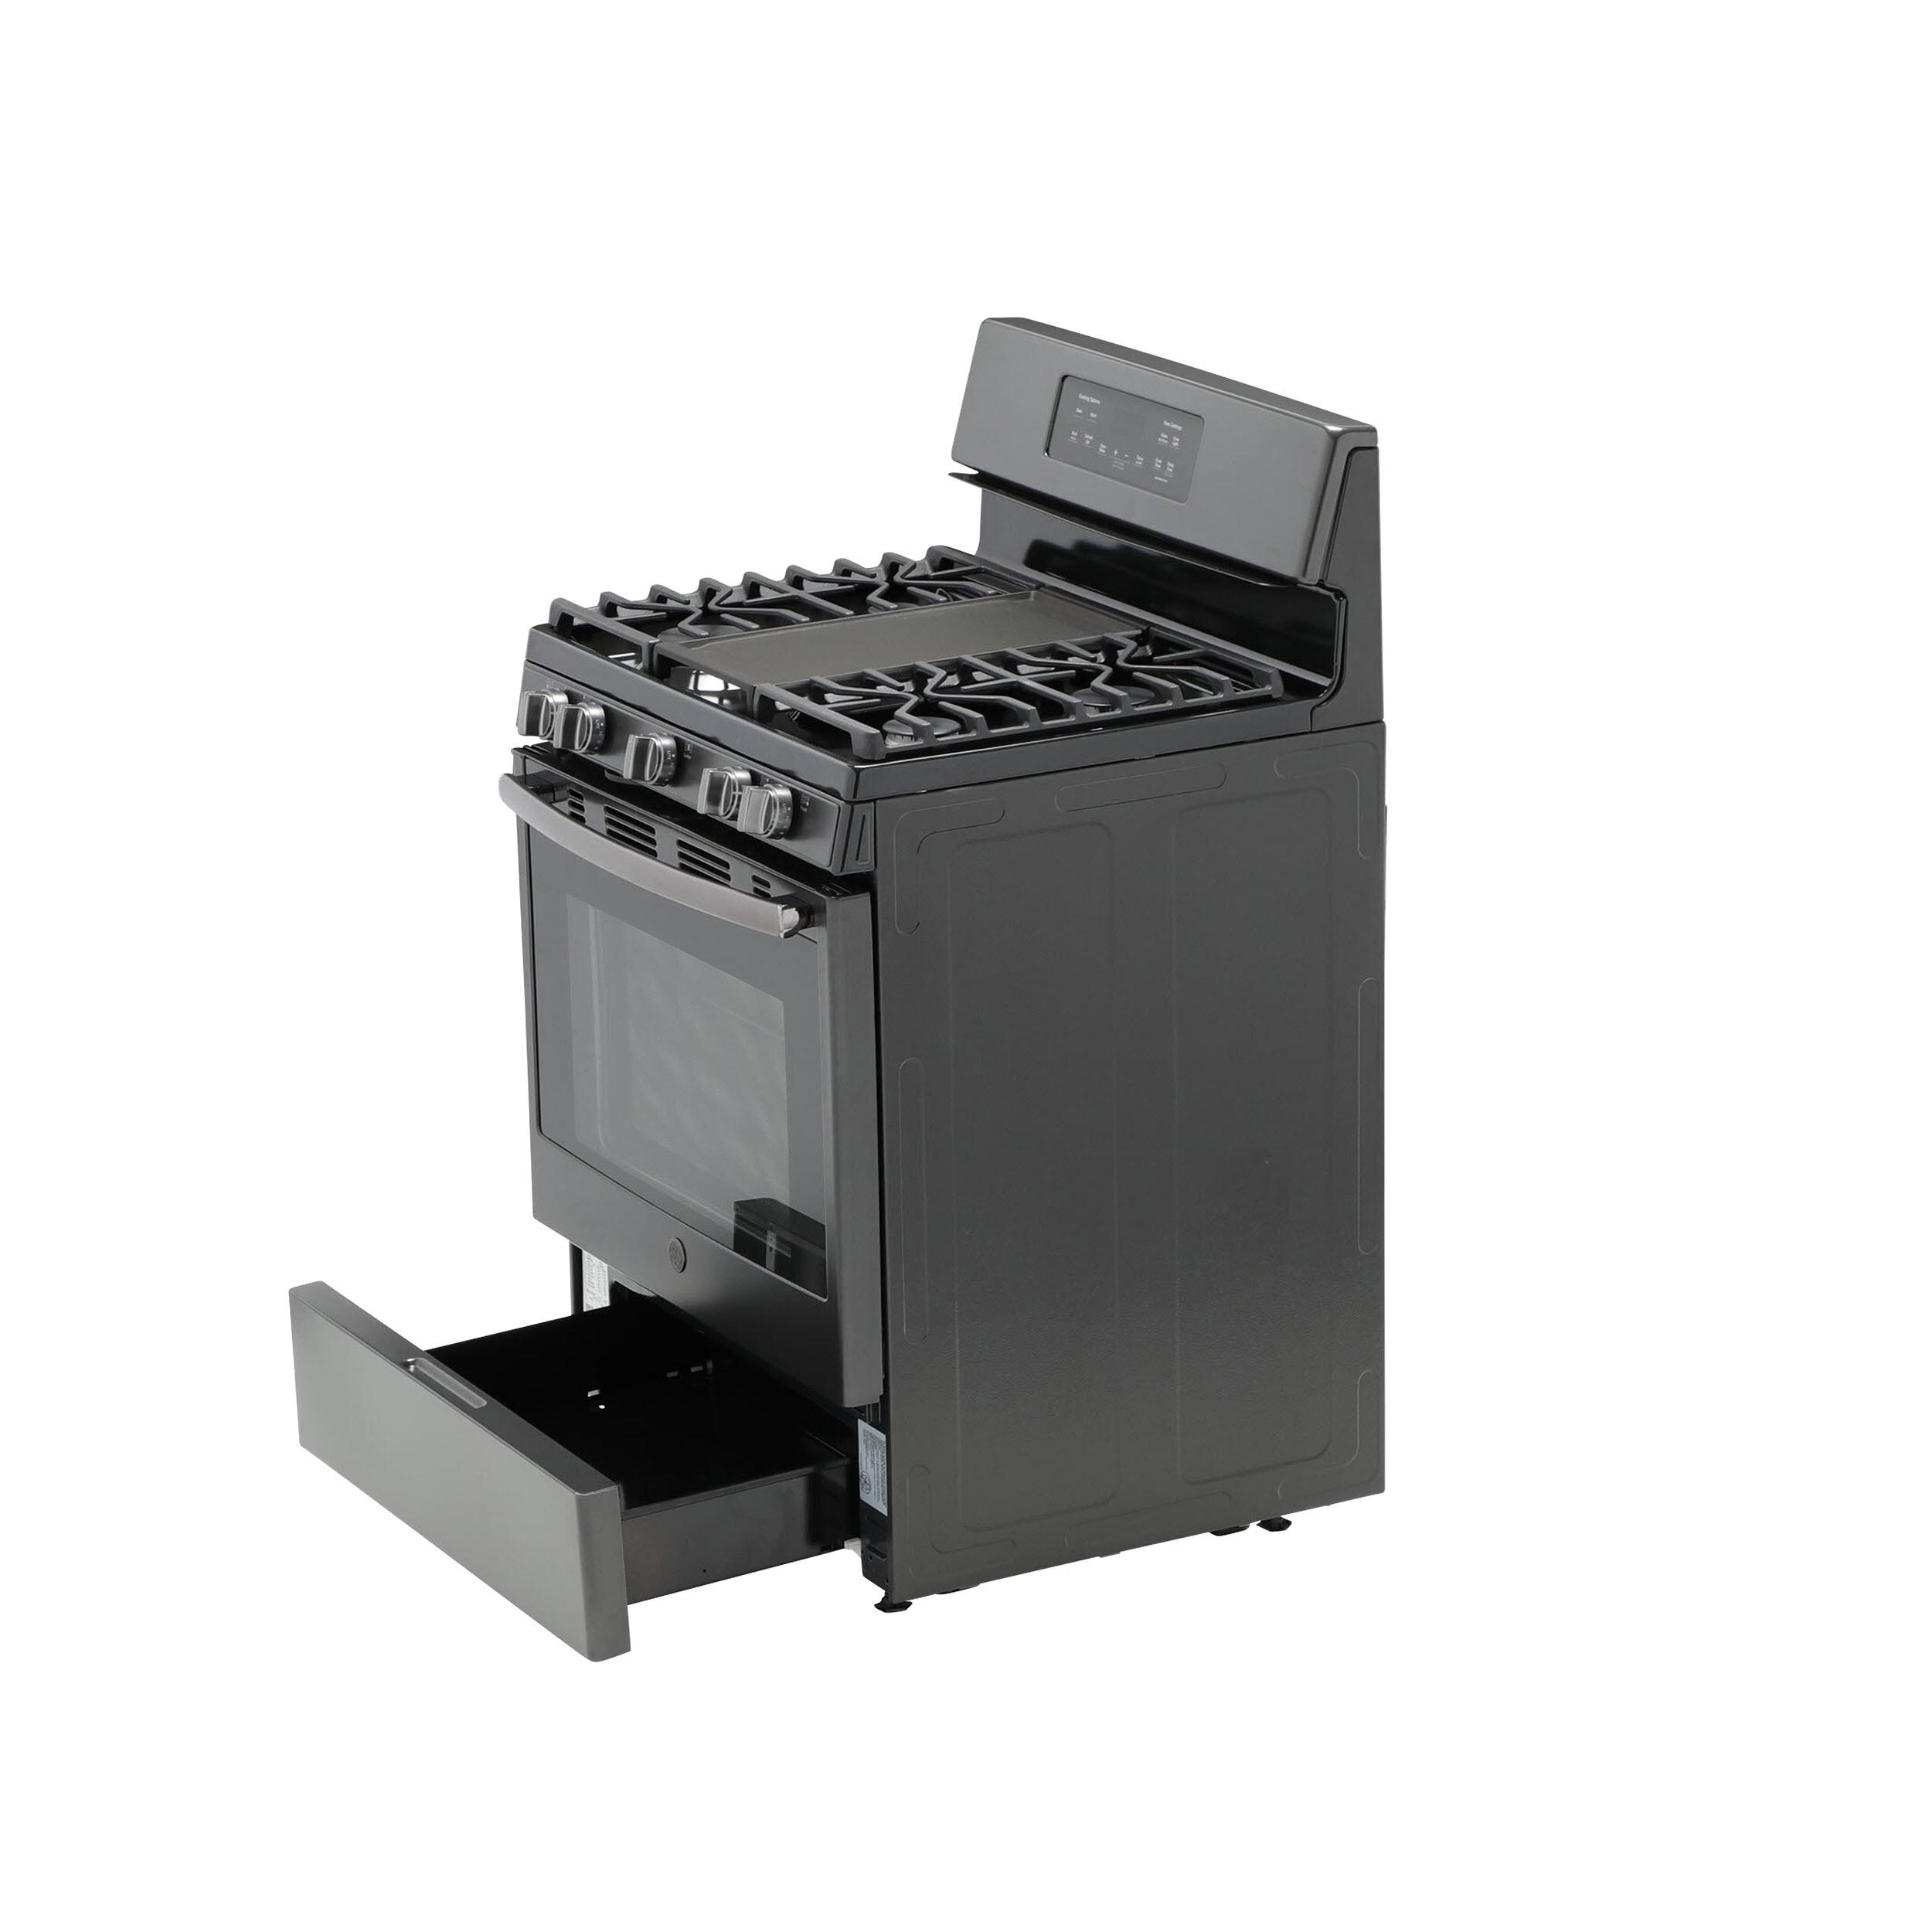 Model: JGB700FEJDS | GE® 30